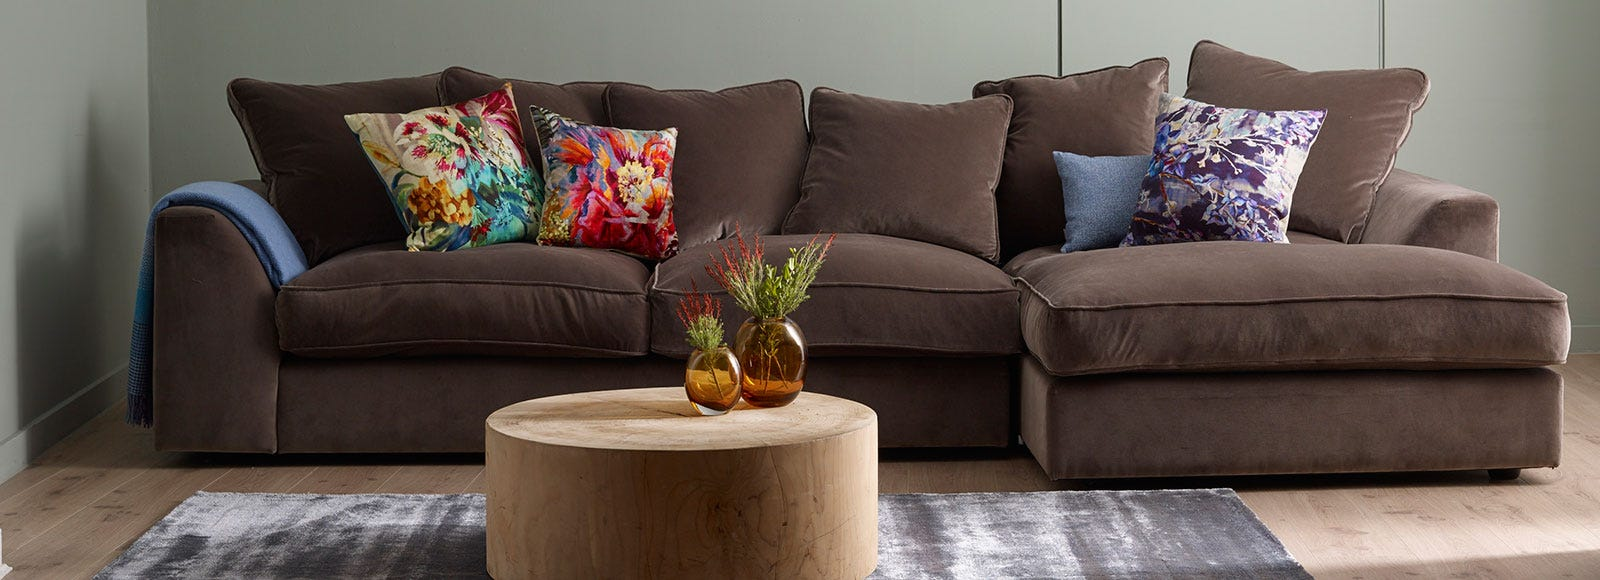 Cumulus Right Hand Facing Corner Sofa in Velvet Charcoal